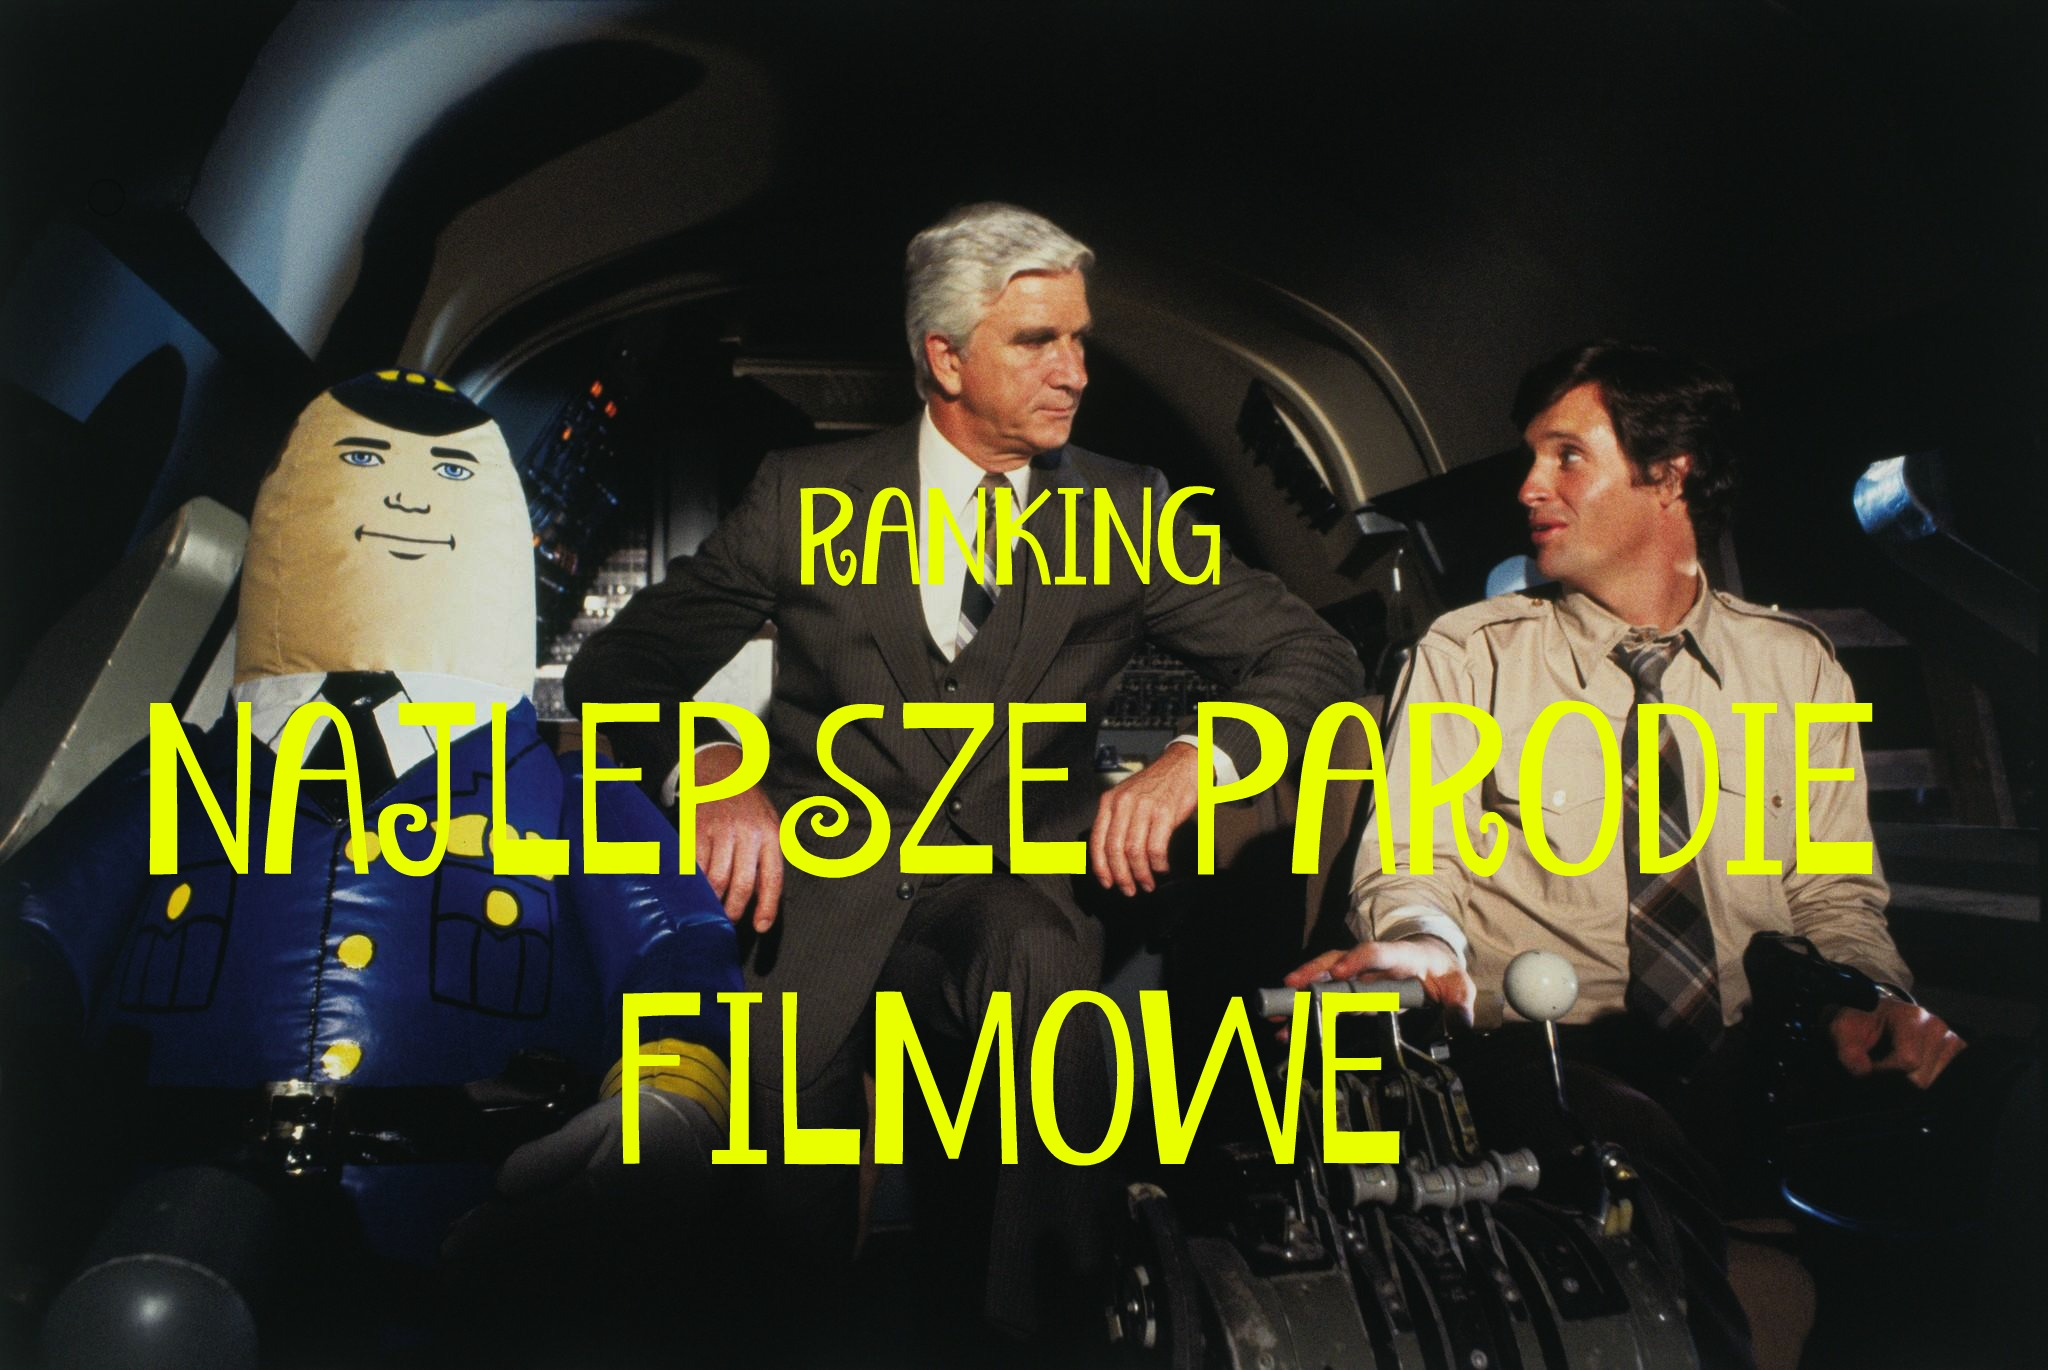 Film Parodie